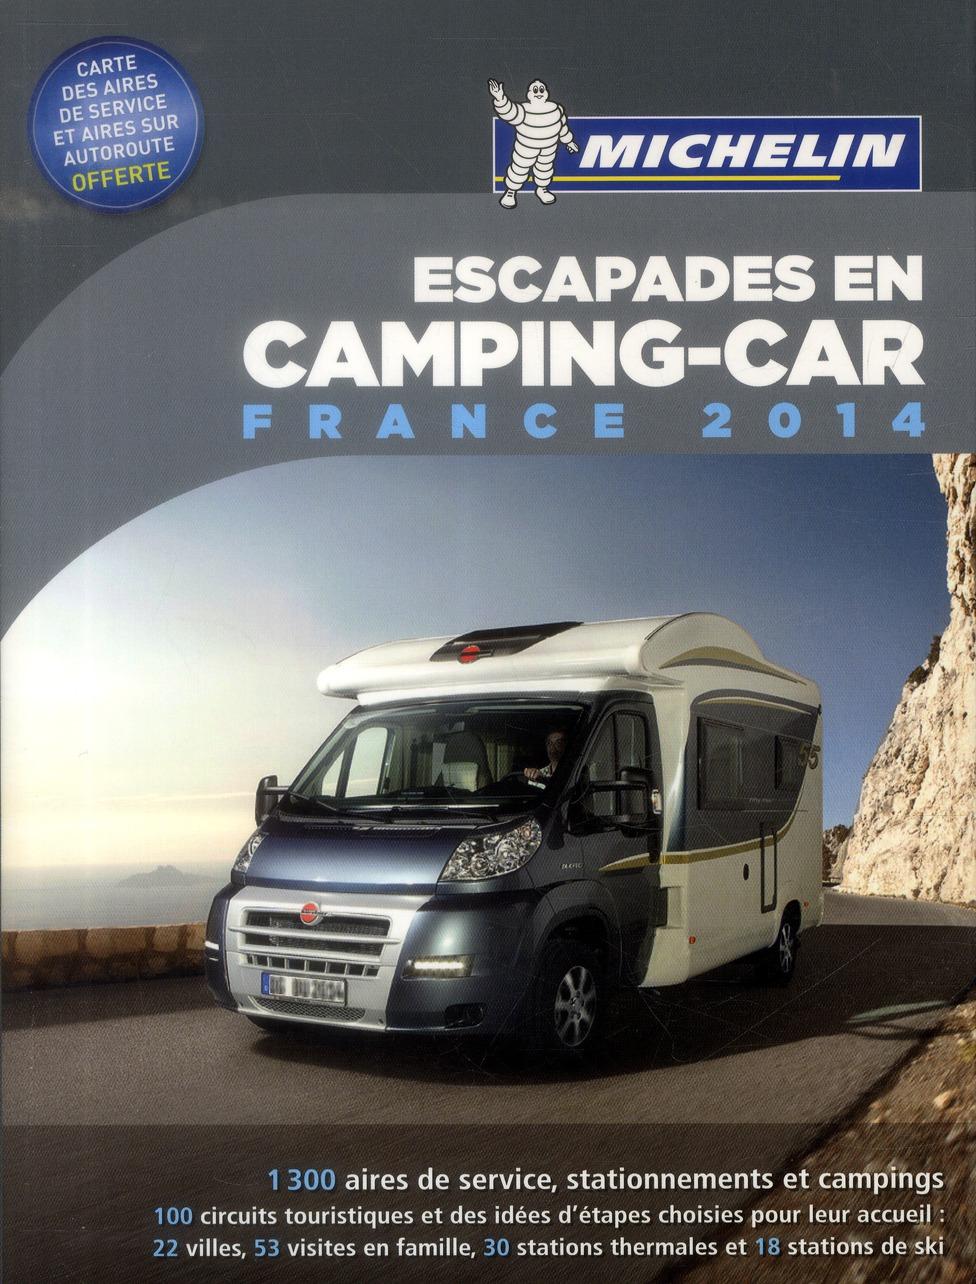 ESCAPADES EN CAMPING-CAR FRANCE 2014